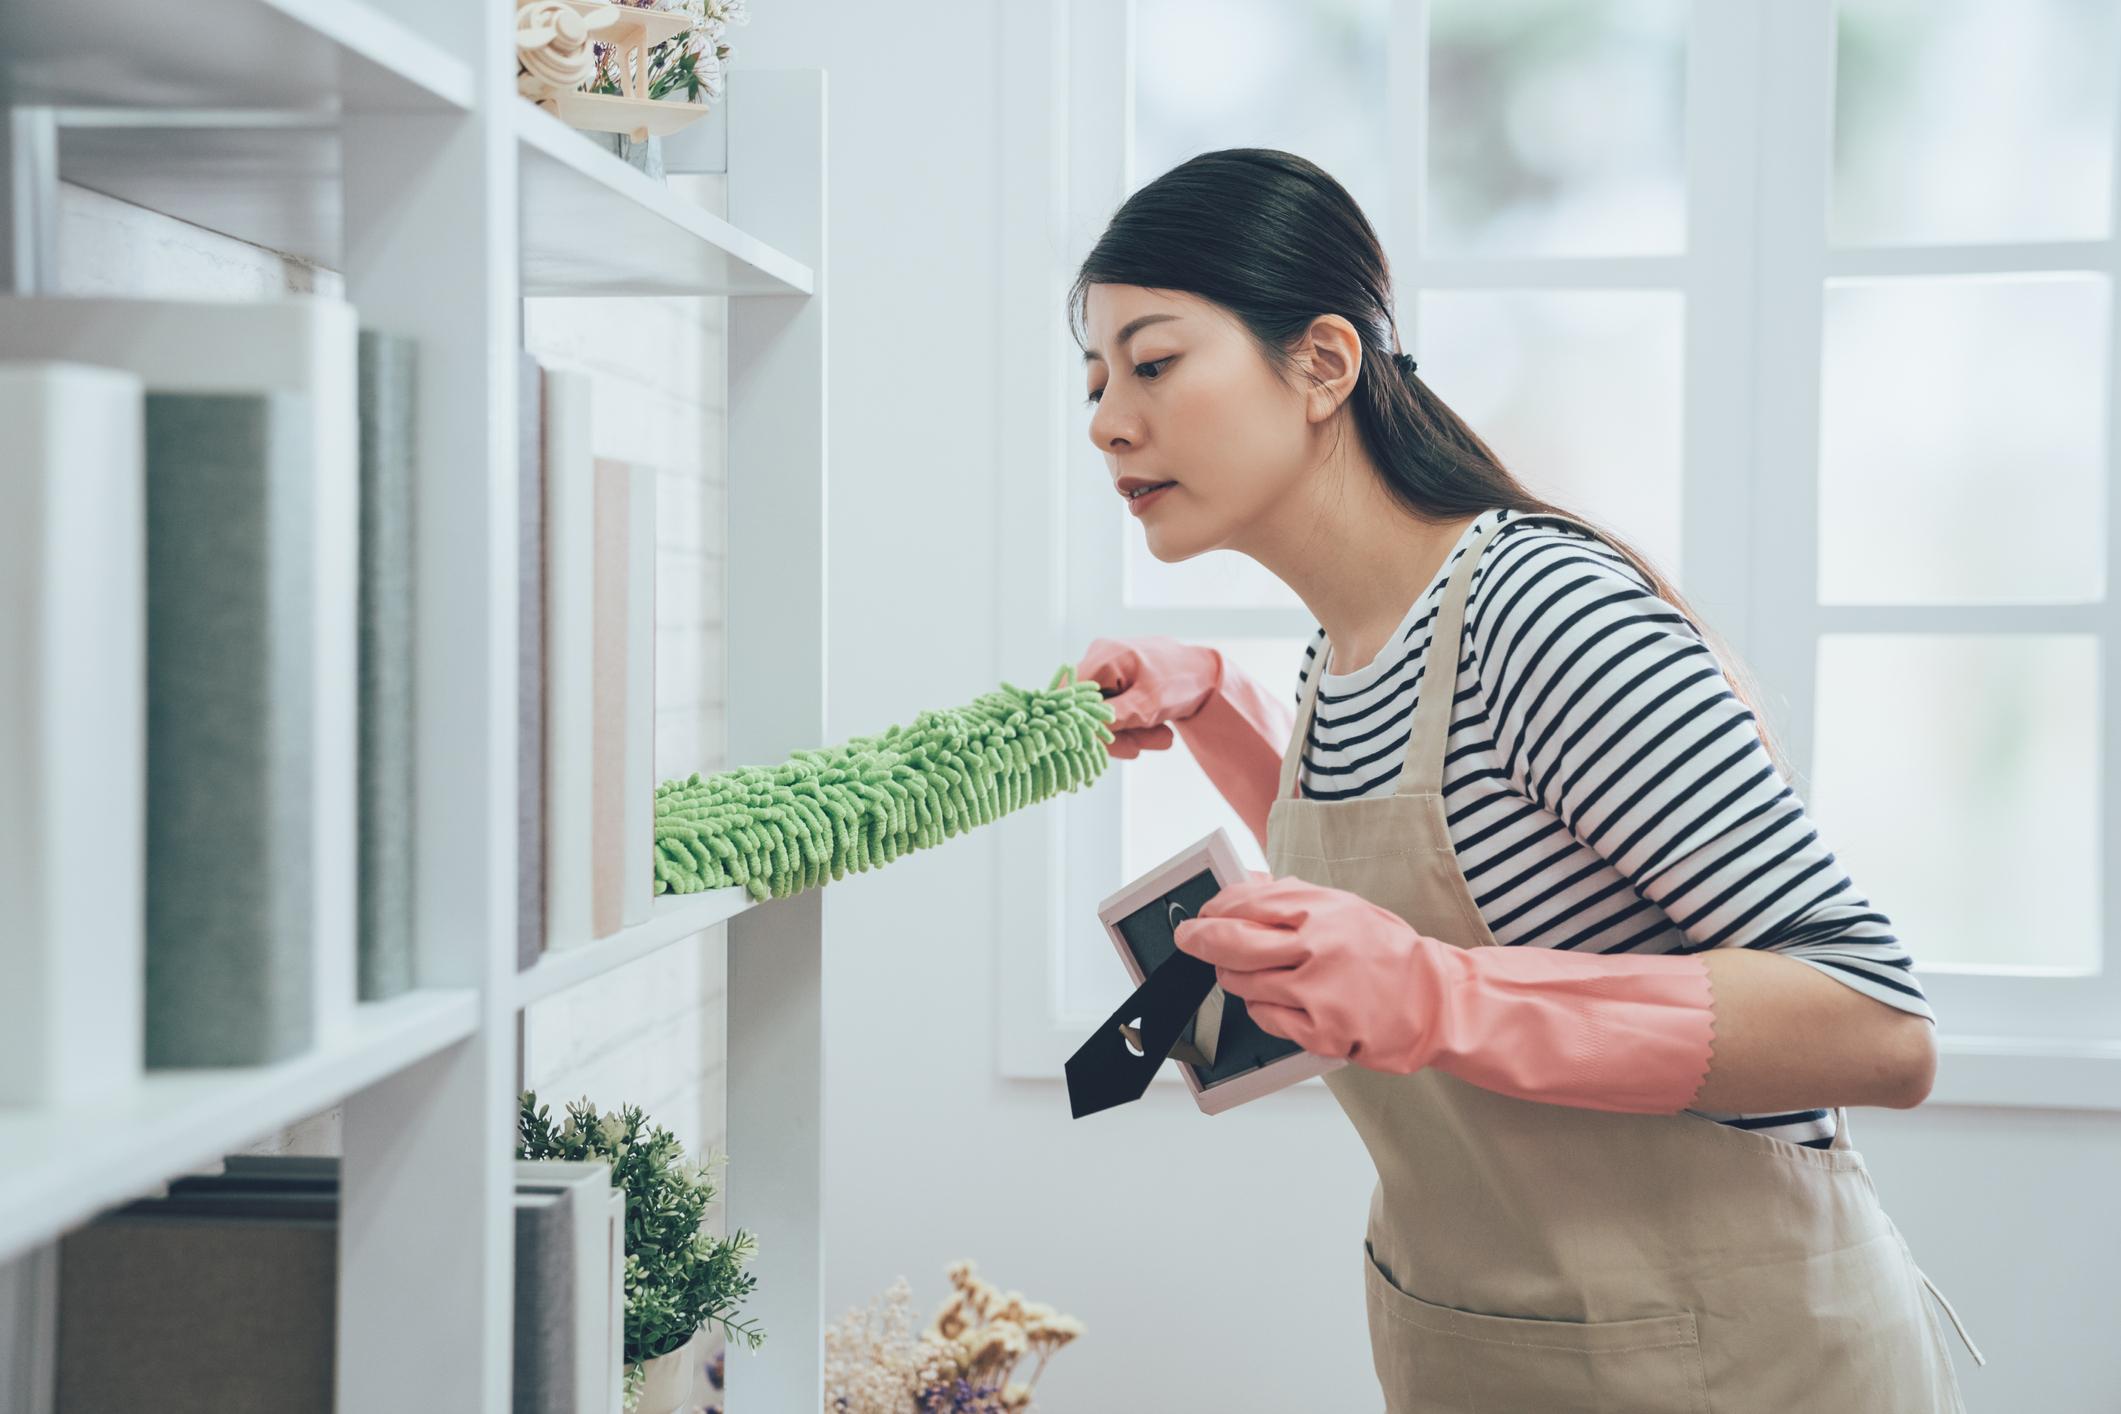 woman dusting behind the bookshelves